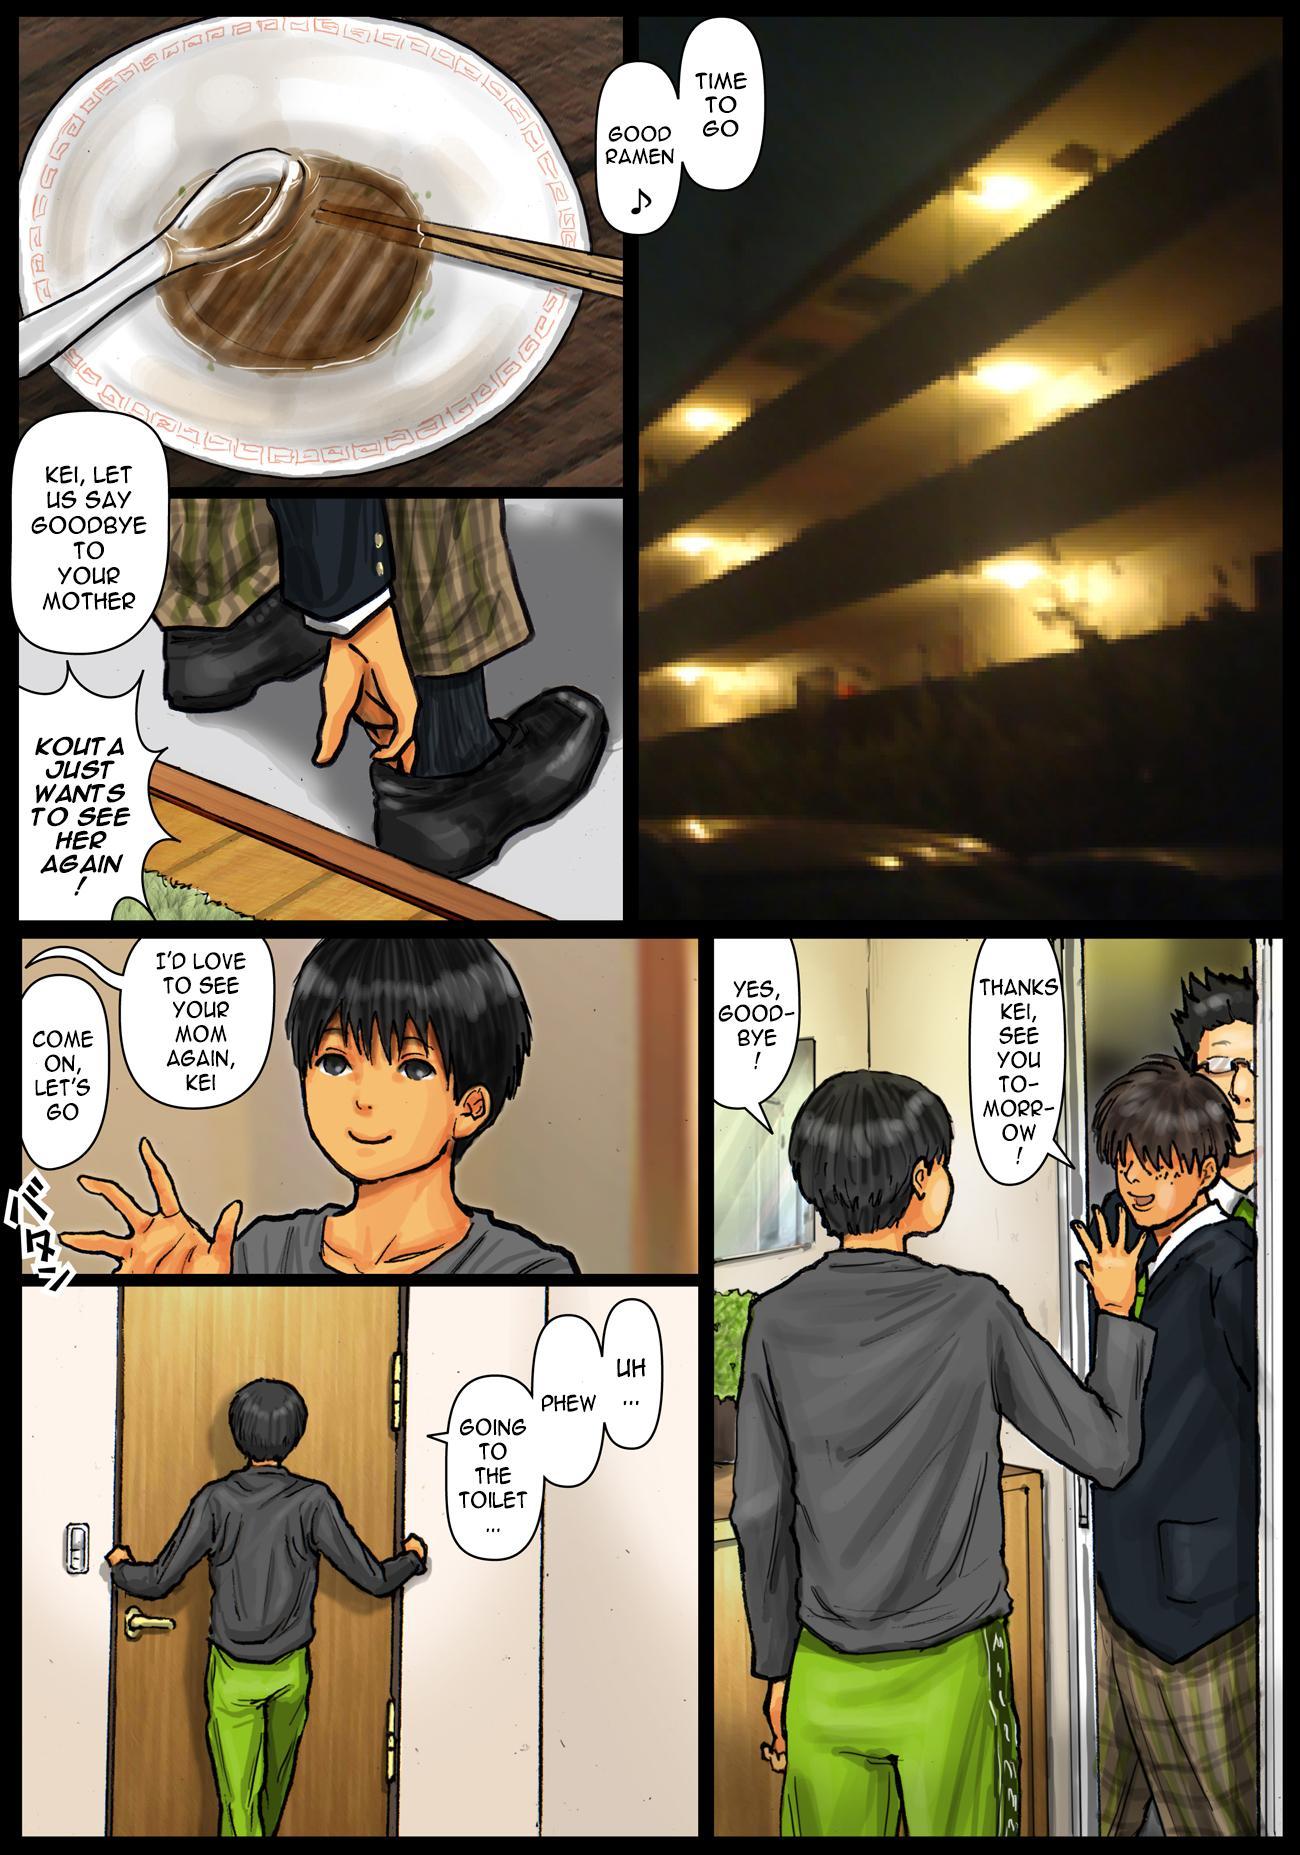 [Kuroneko Smith] Kaa-san no Ana Tsukawasete ~Zenpen~ | Cumming Inside Mommy's Hole 1 [English] [MonaS] [Digital] 15